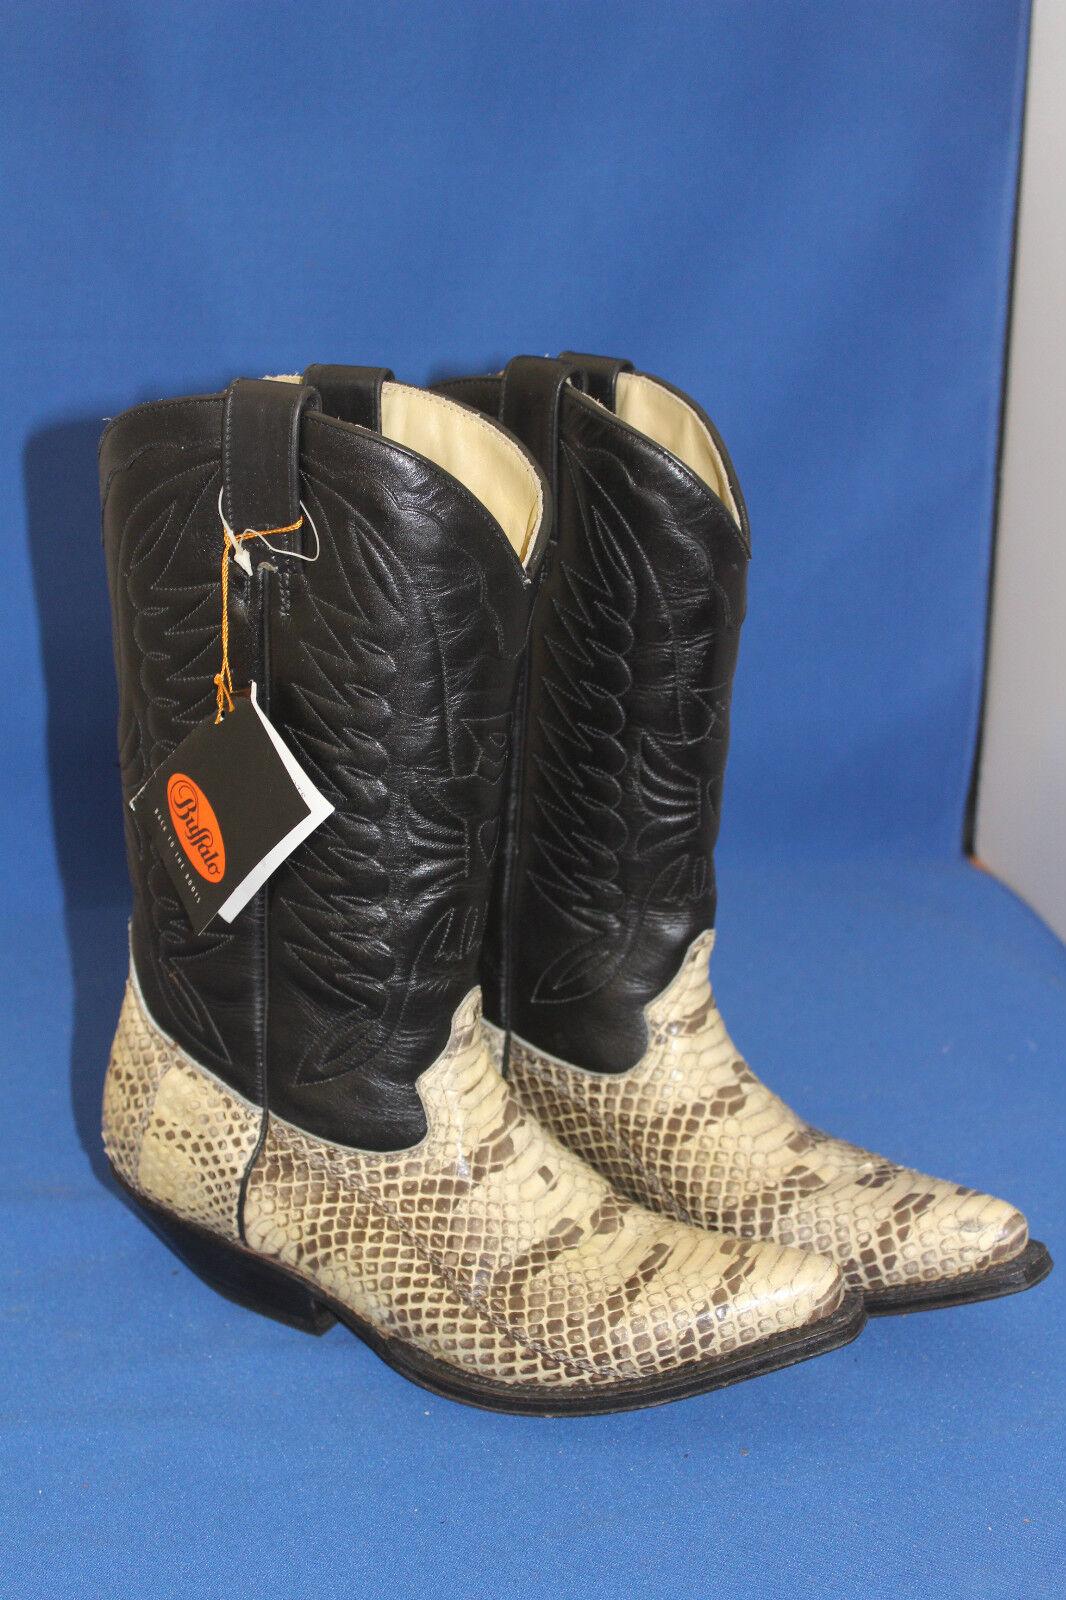 Buffalo Boots Stiefel westernstiefel python schlange cowboystiefel  gr. 41 neu